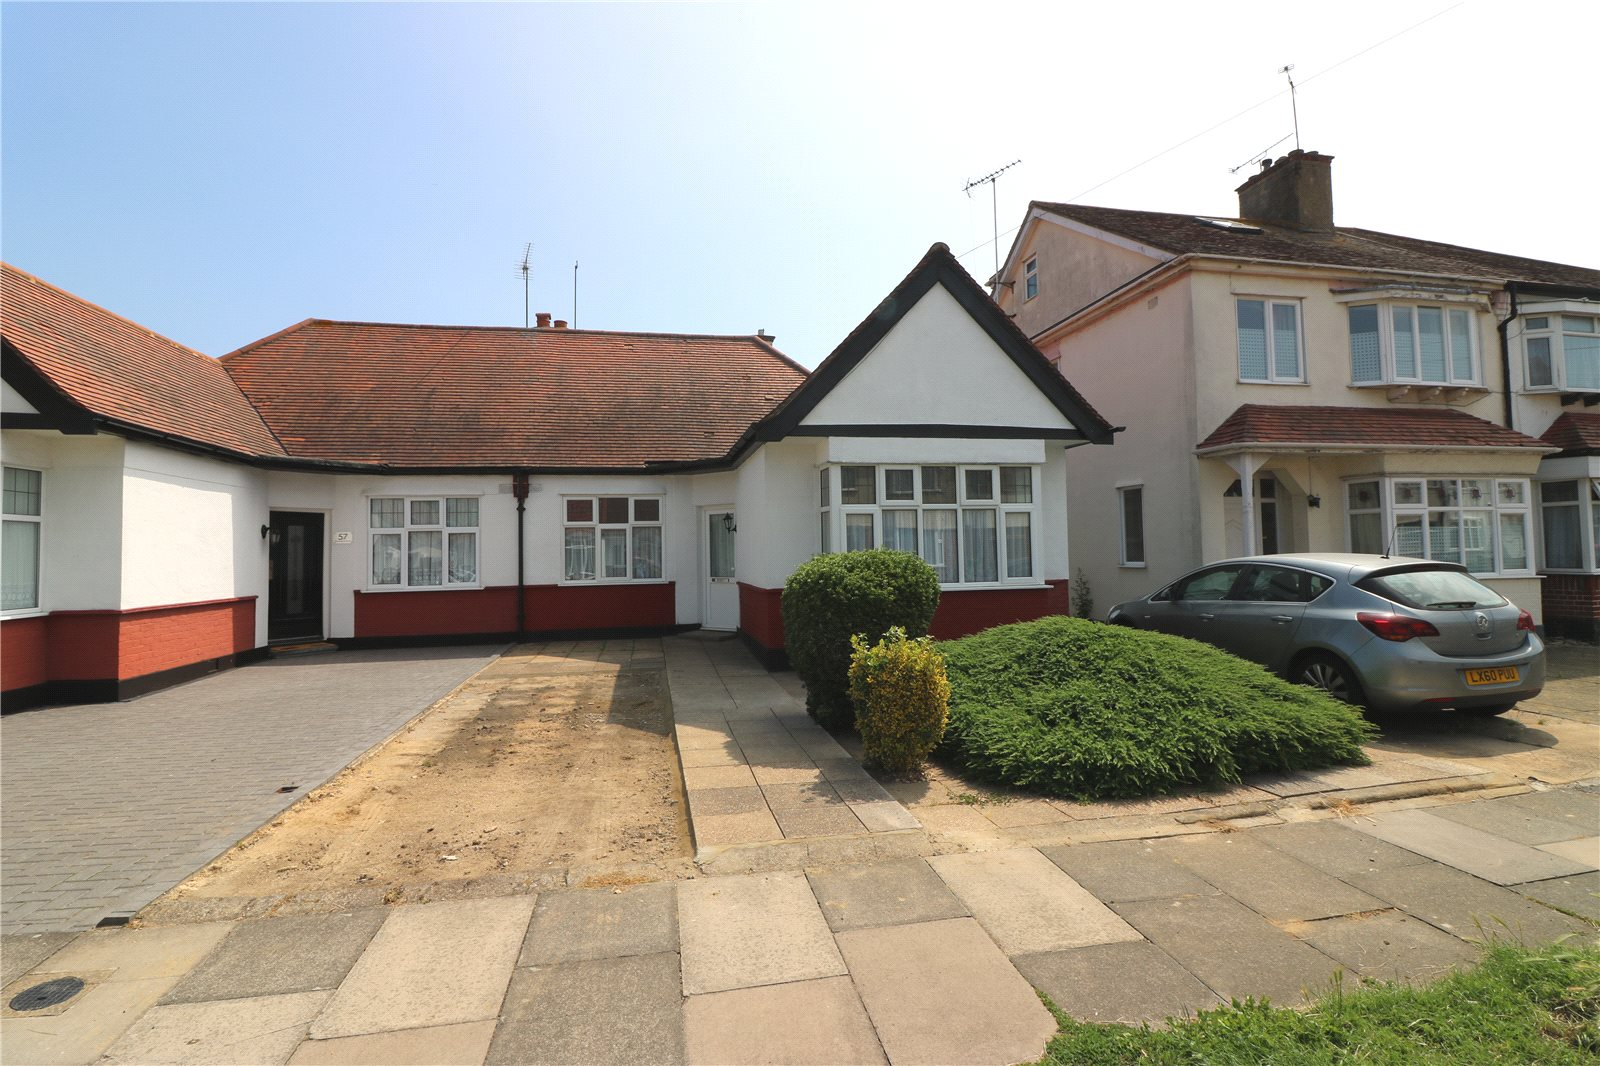 Walsingham Road, Southend-on-Sea, Essex, SS2